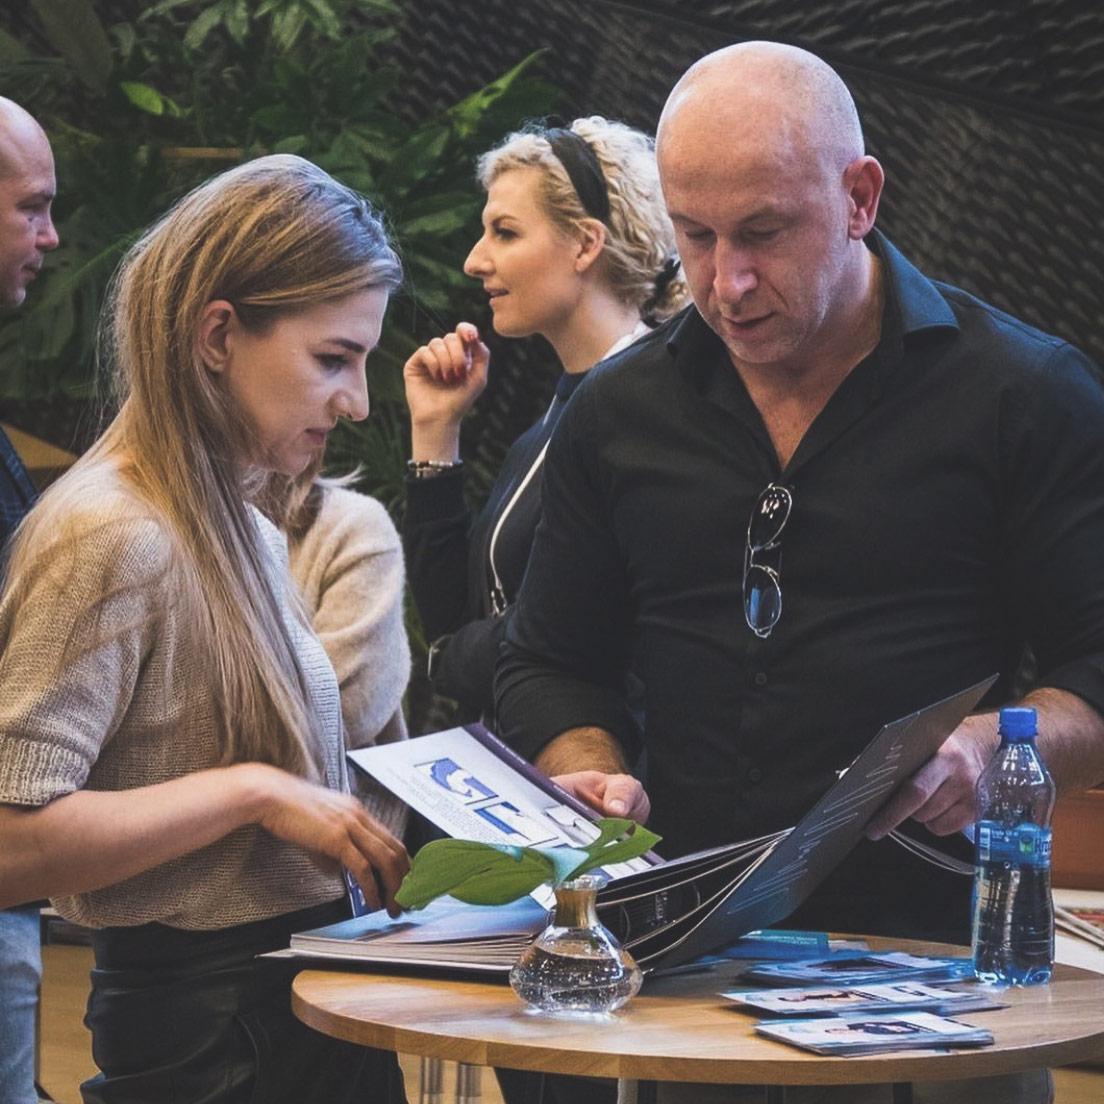 Krzysztof Miruć na stoisku Architected Sound podczas targów 4 Design Days